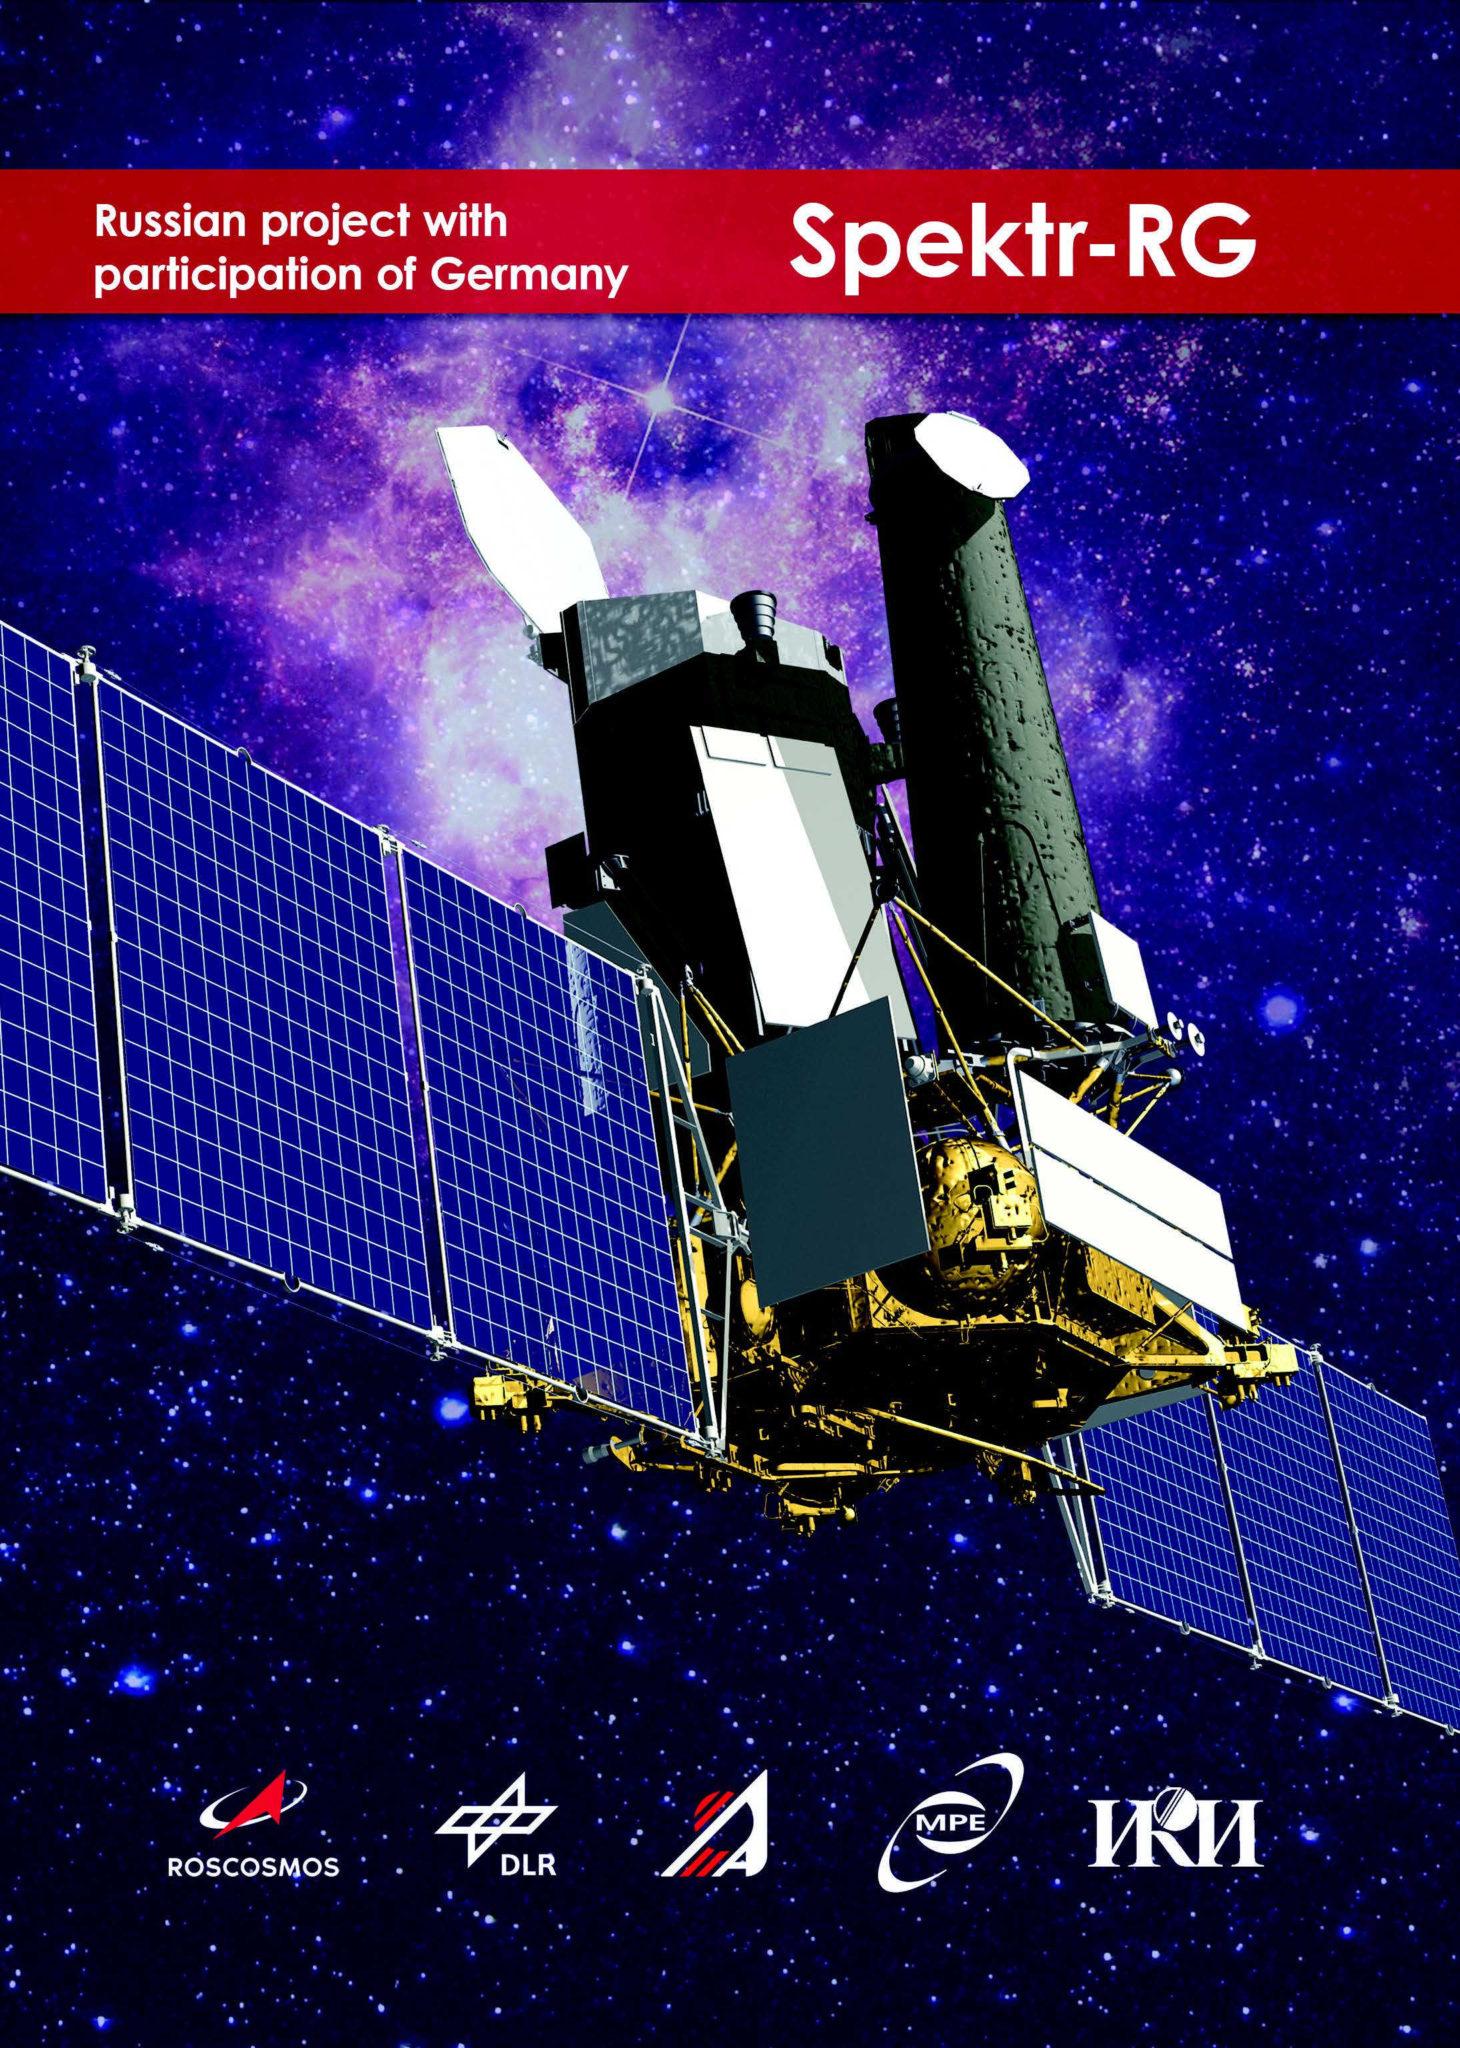 «Спектр-РГ». Изображение с сайта roscosmos.ru